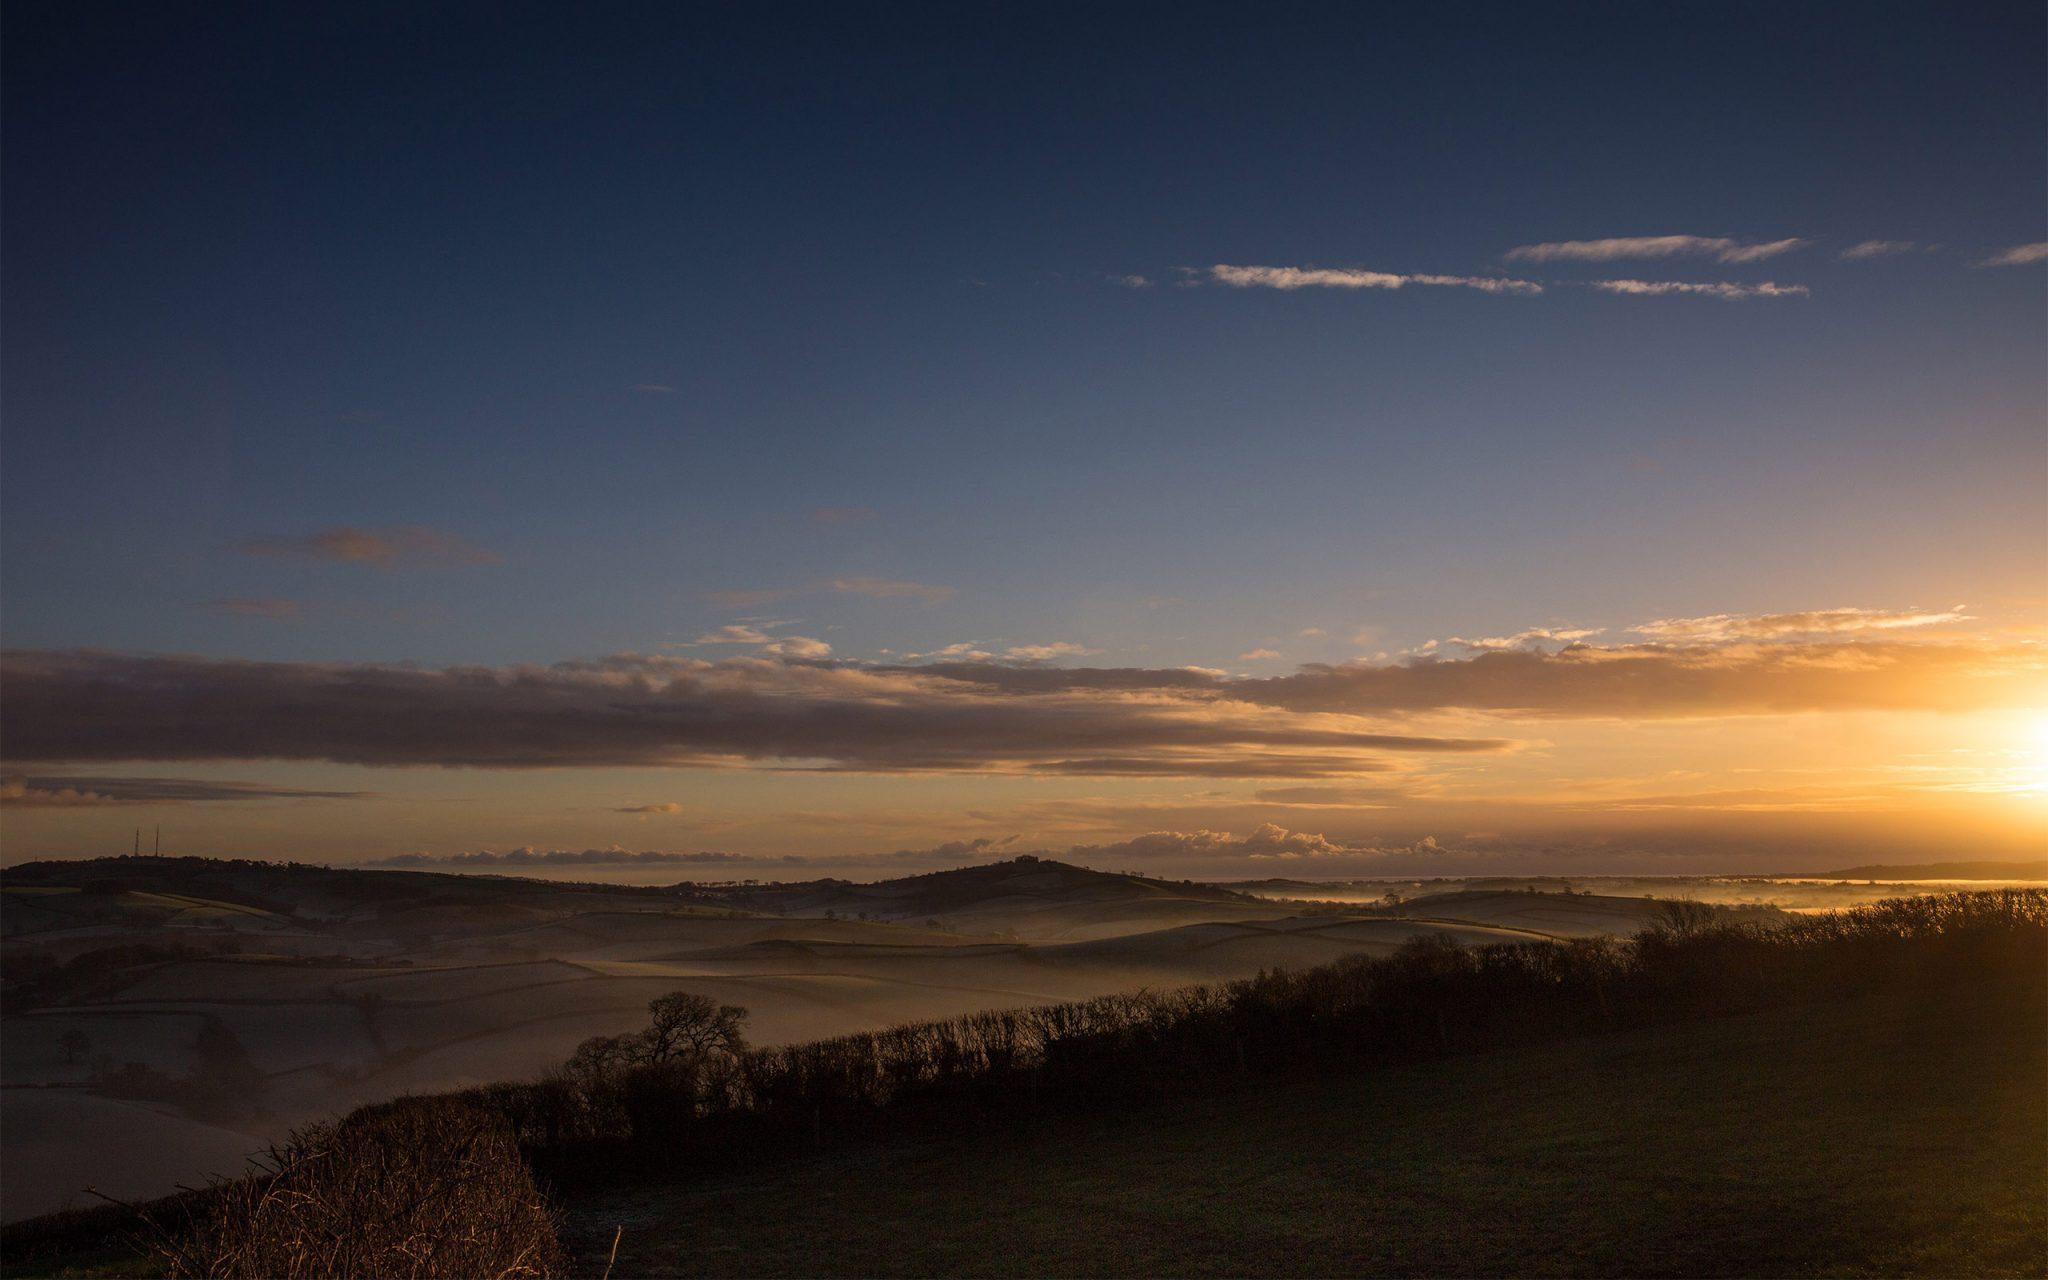 Carey Marks Photography, South Hams, South Devon, Devon, nature, environmental science, Landscape, Landscape photography, Dartmoor, Rainstorm, Vista, Panorama, Landscape photography,